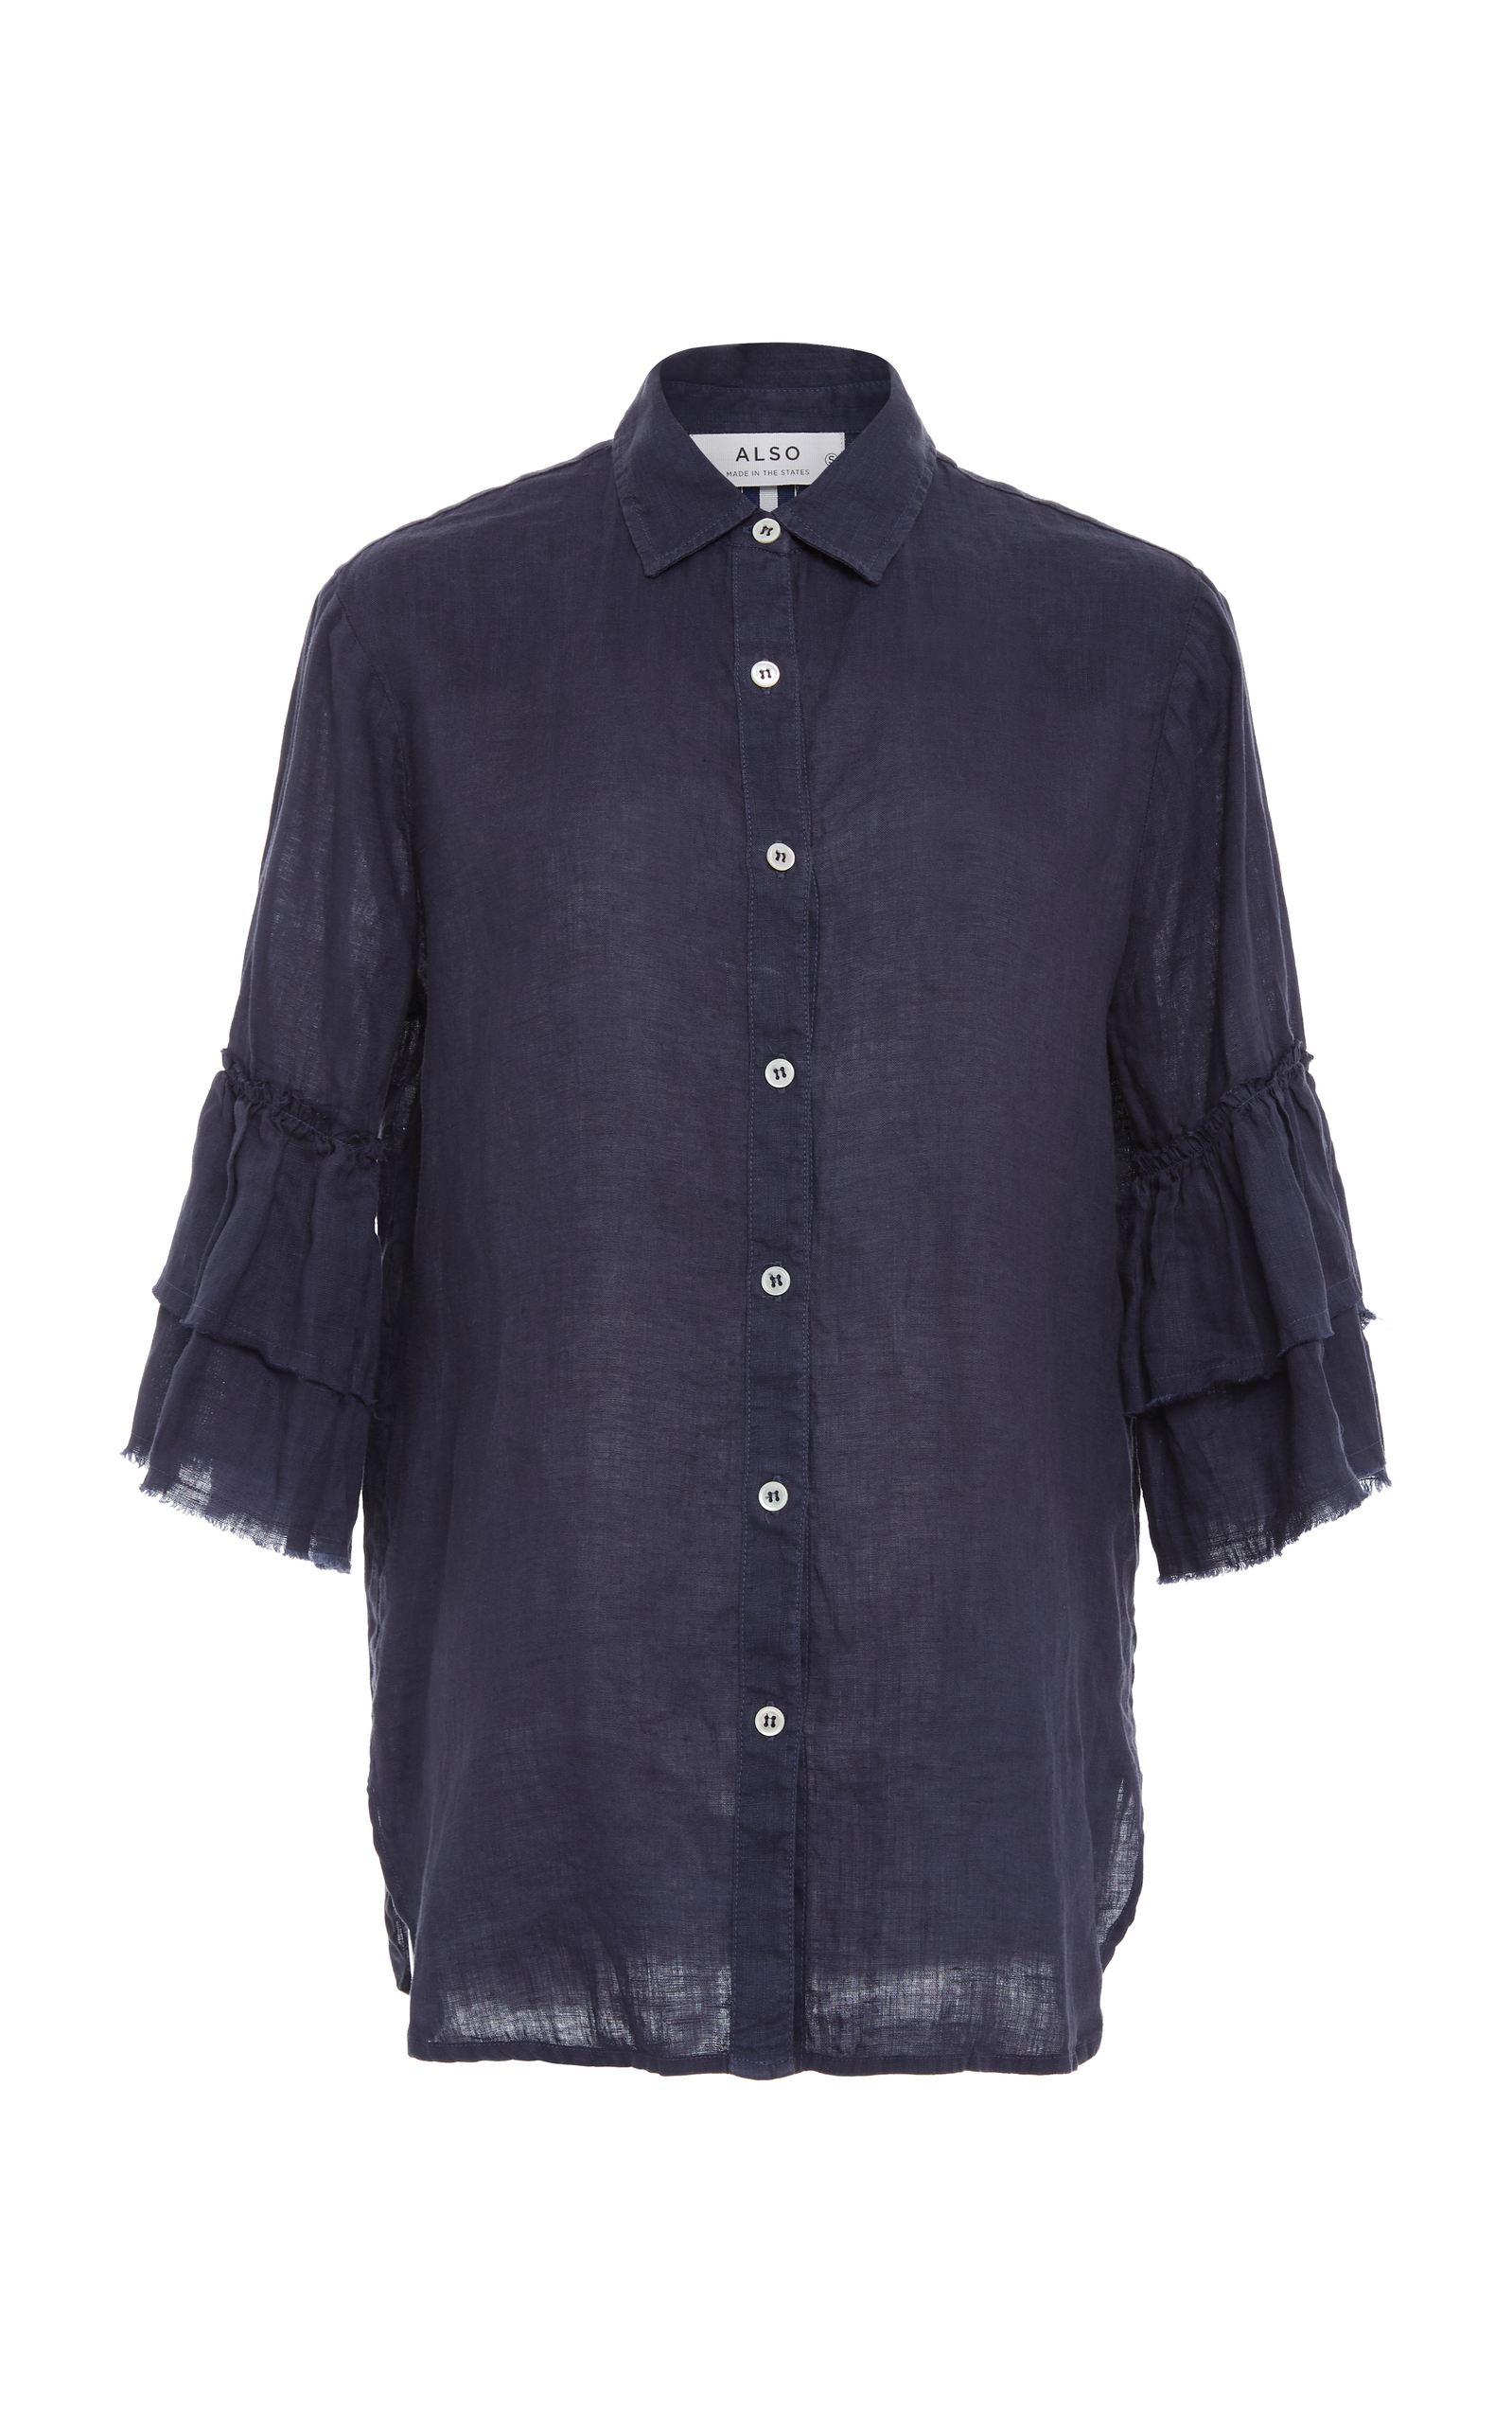 ALSO Josephine Shirt in Blue